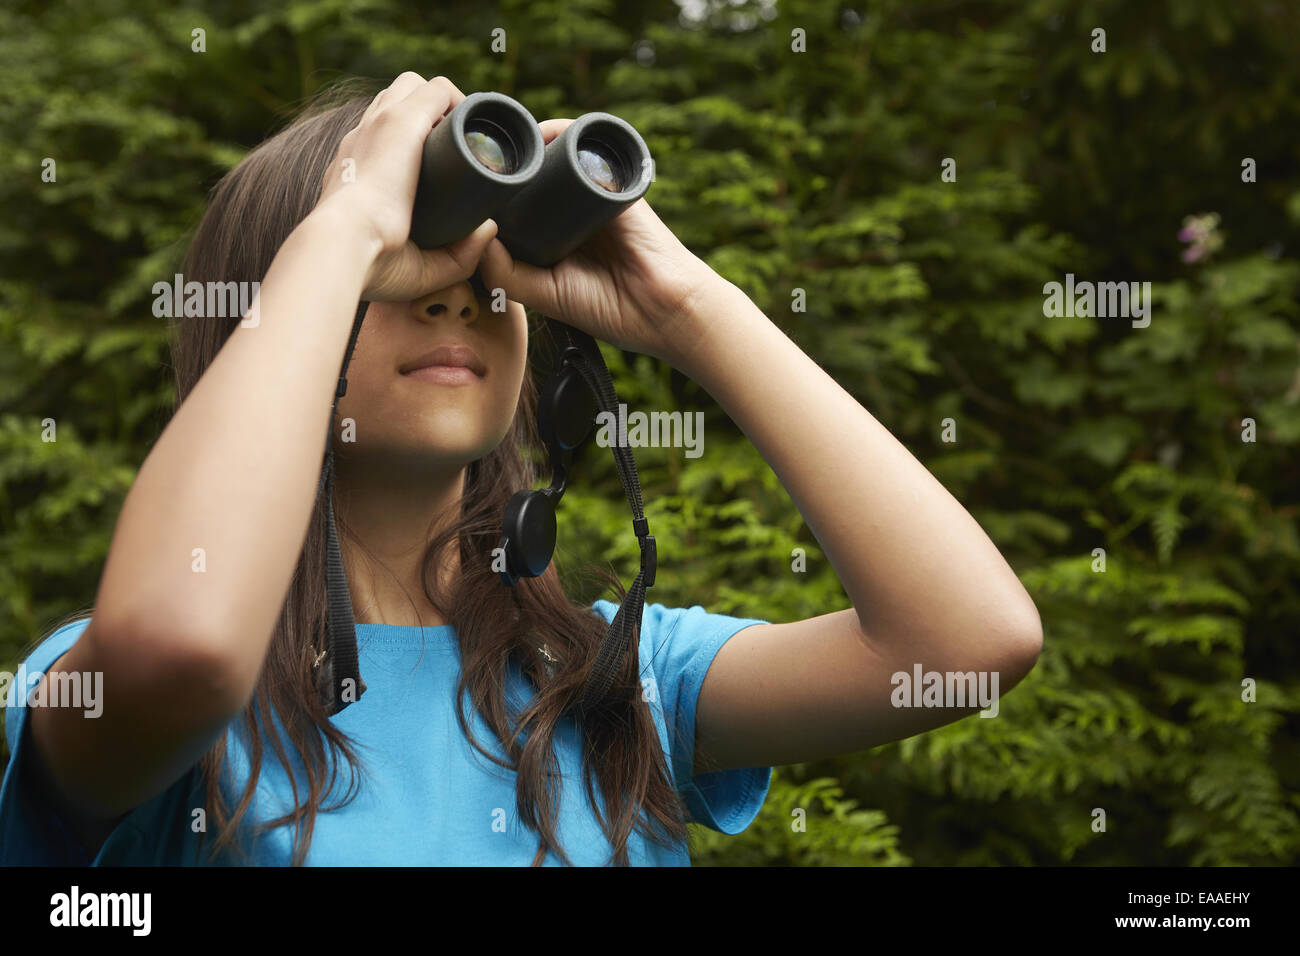 A young girl with bird watching binoculars. - Stock Image